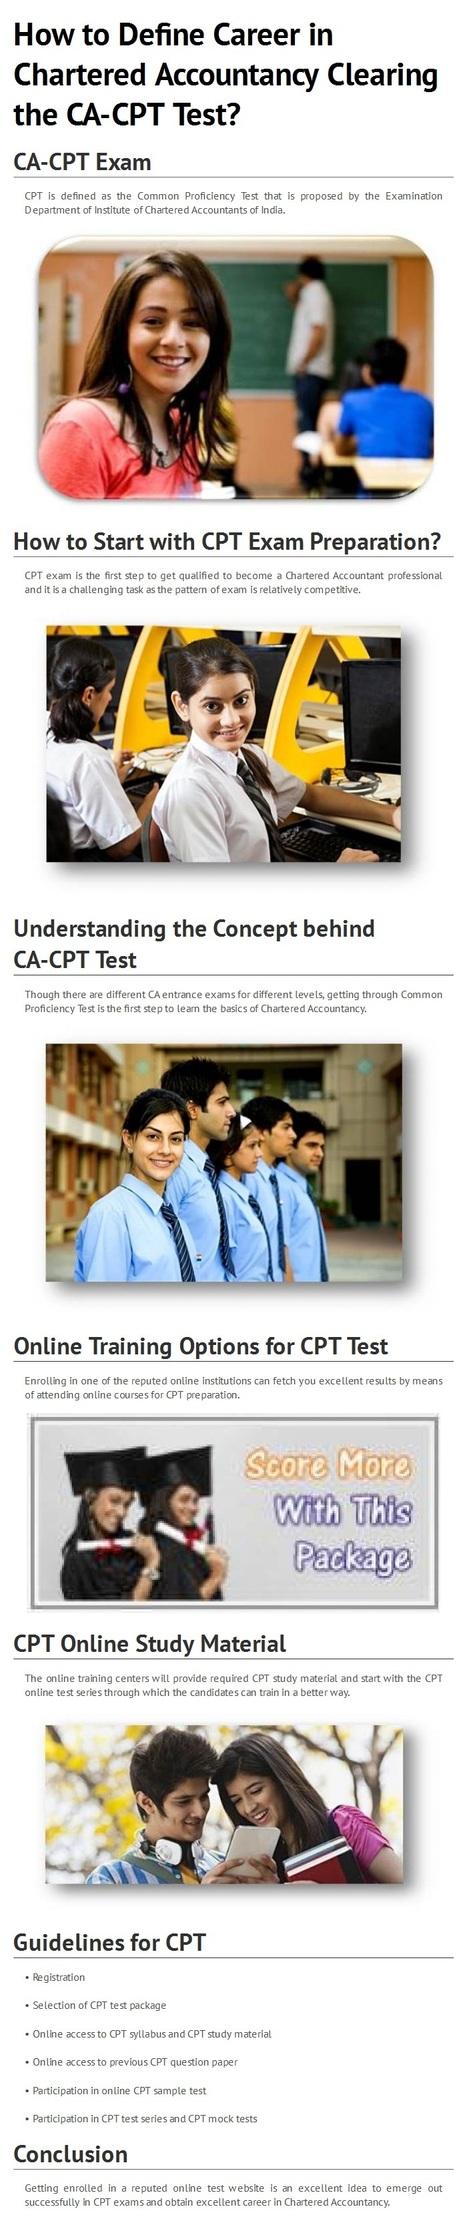 How to Get Success in CA-CPT Test By www.entranceprime.com | EntrancePrime | Scoop.it